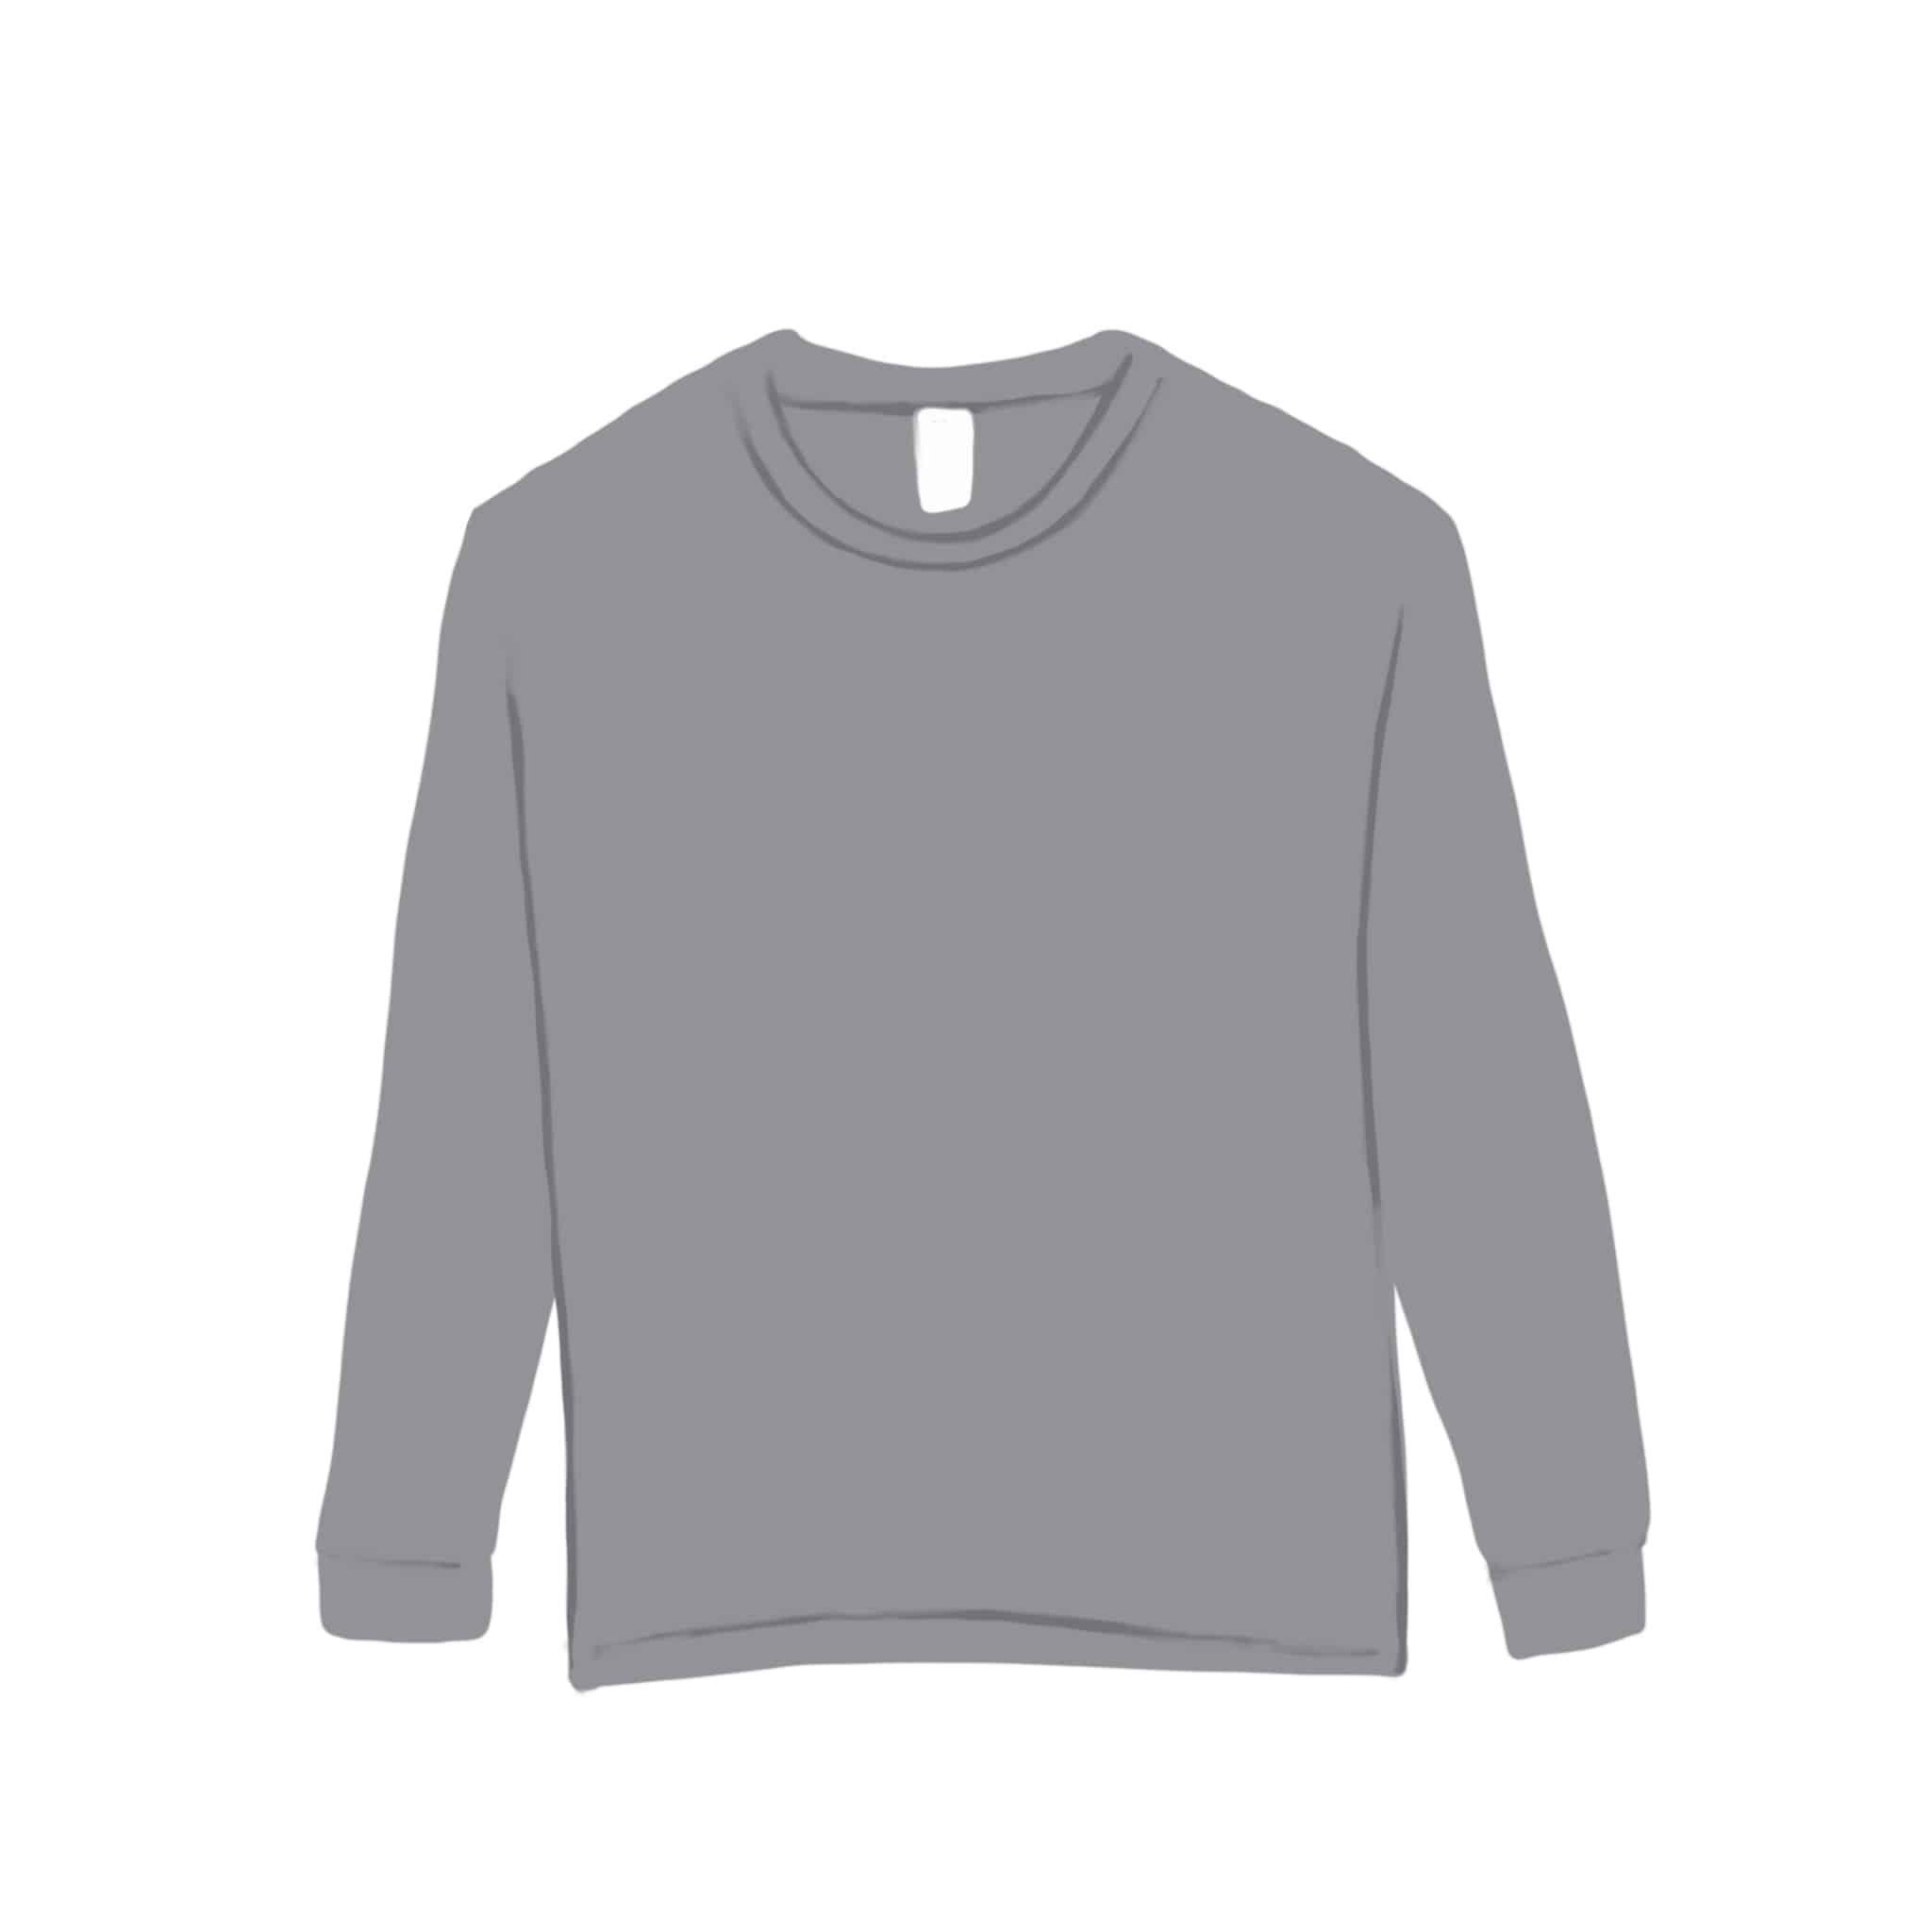 TTFORTEE- Gildan T-Shirt (long sleeve)Grey